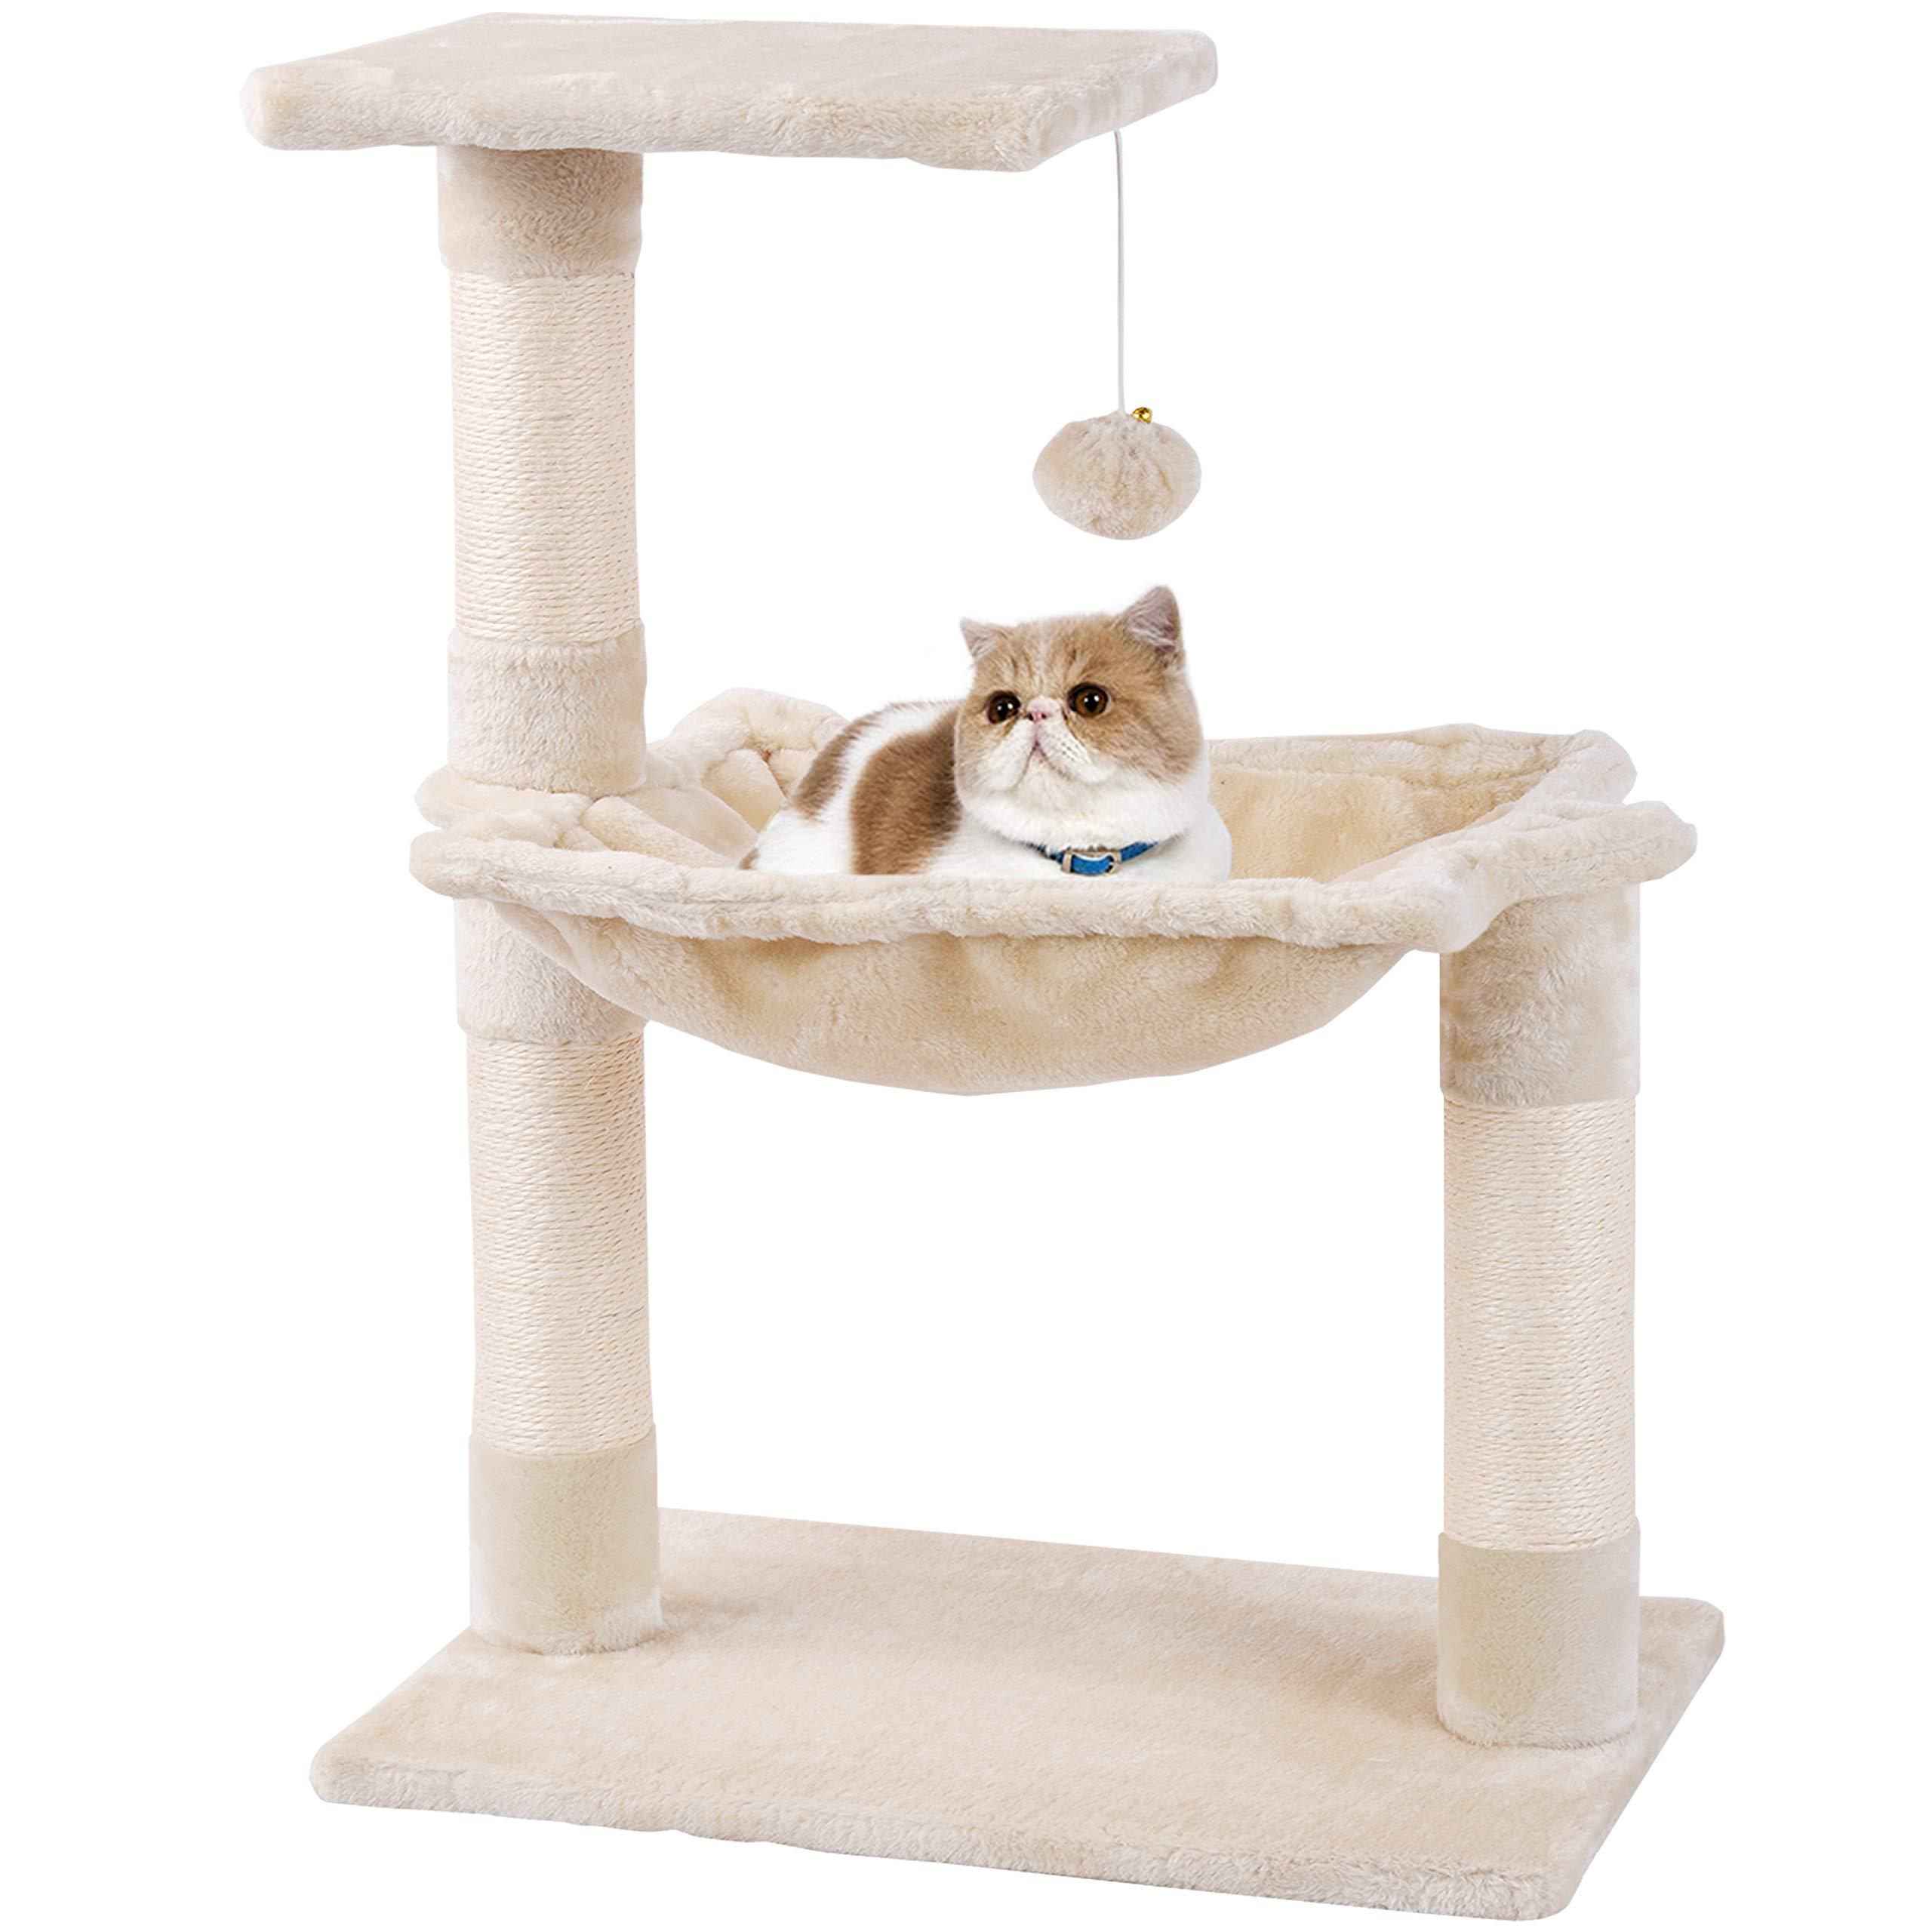 MC Star Árbol para Gato pequeño con Grandes Hamaca Rascador Cama Bolas de Juego Arañazo Plataforma Sisal Natural 70cm, Beige